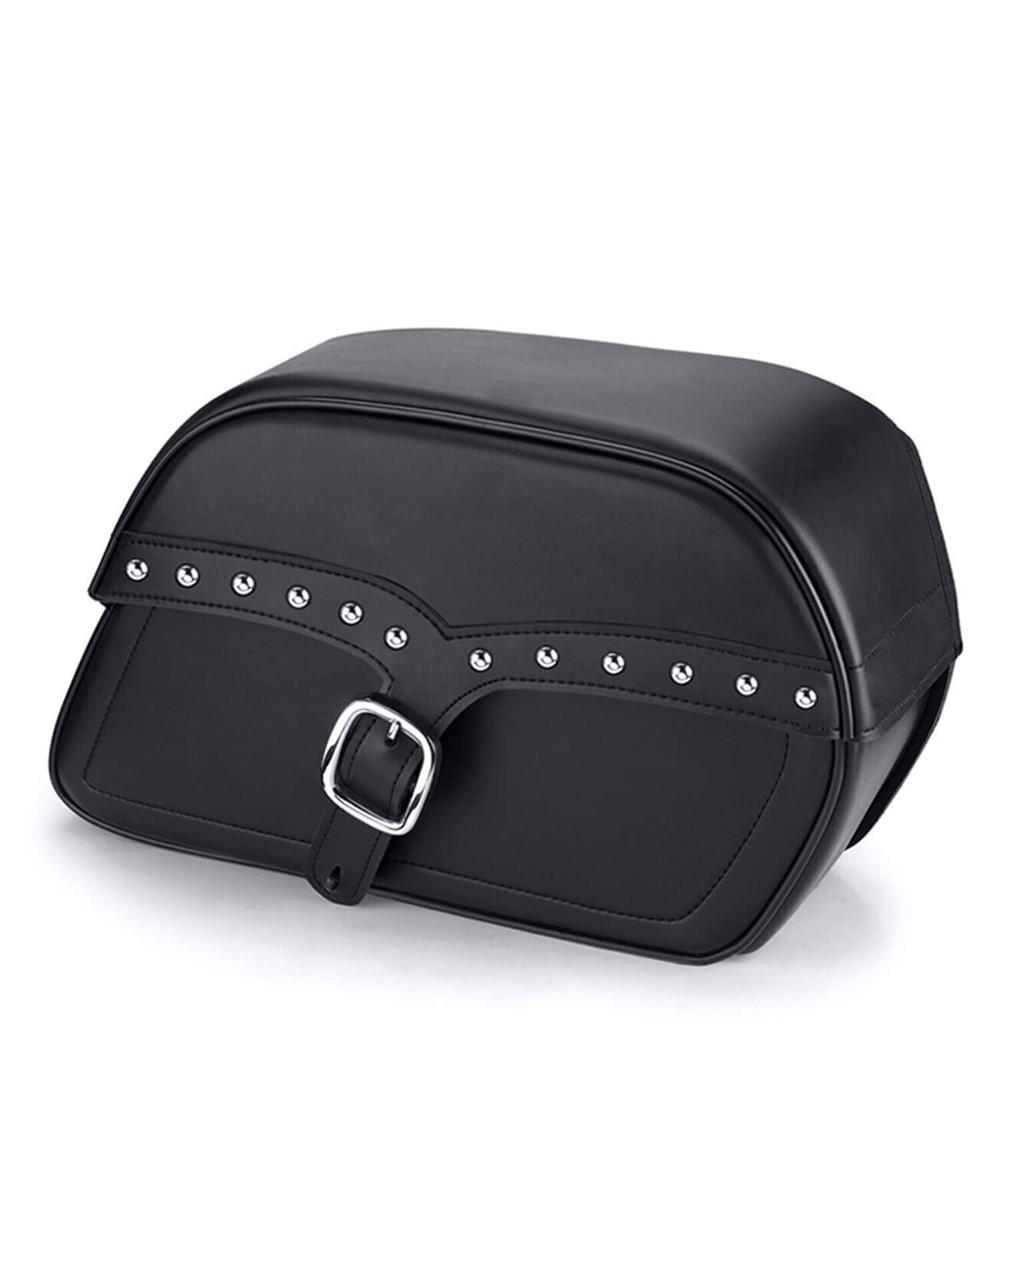 Suzuki Intruder 1500 VL1500 SS Slanted Studded Large Motorcycle Saddlebags Main Bag View